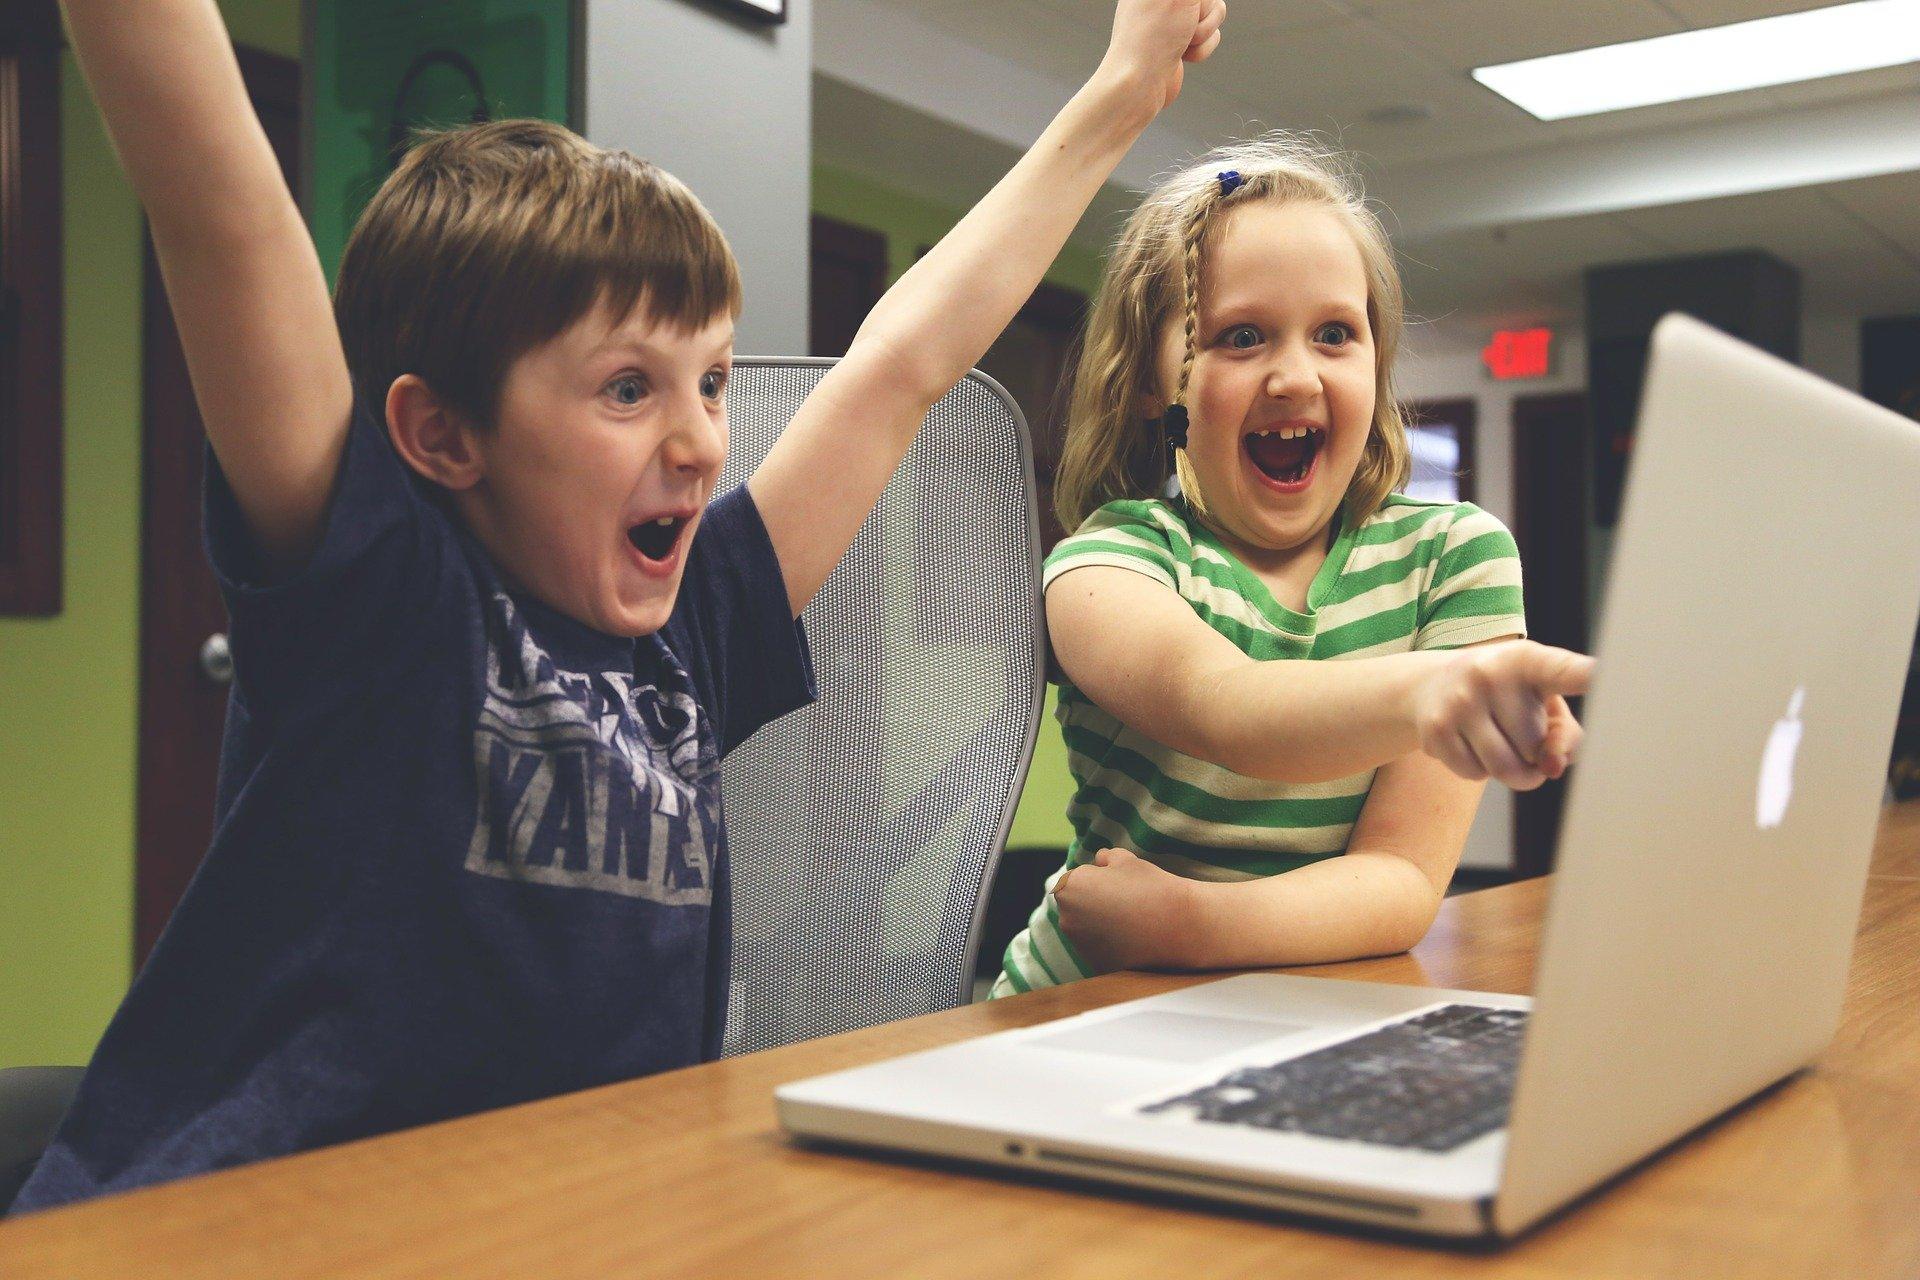 Soziallotterien: Bildungslotterie fördert zum 3. Mal mit schneller Corona-Direkthilfe